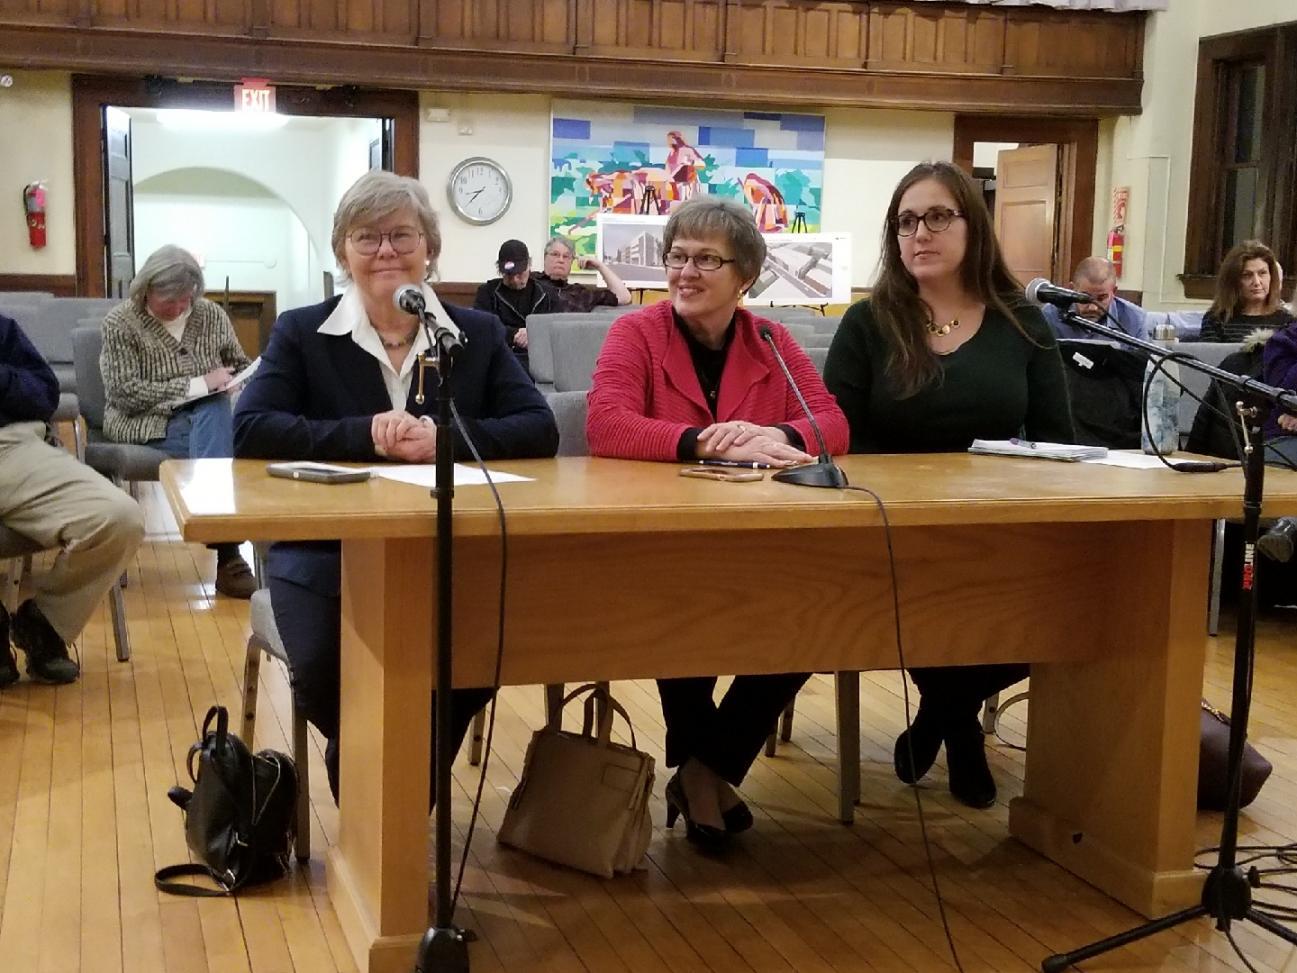 Rep. Johnson, Rep. Orange, Sen. Flexer discuss Windham needs with Town Council